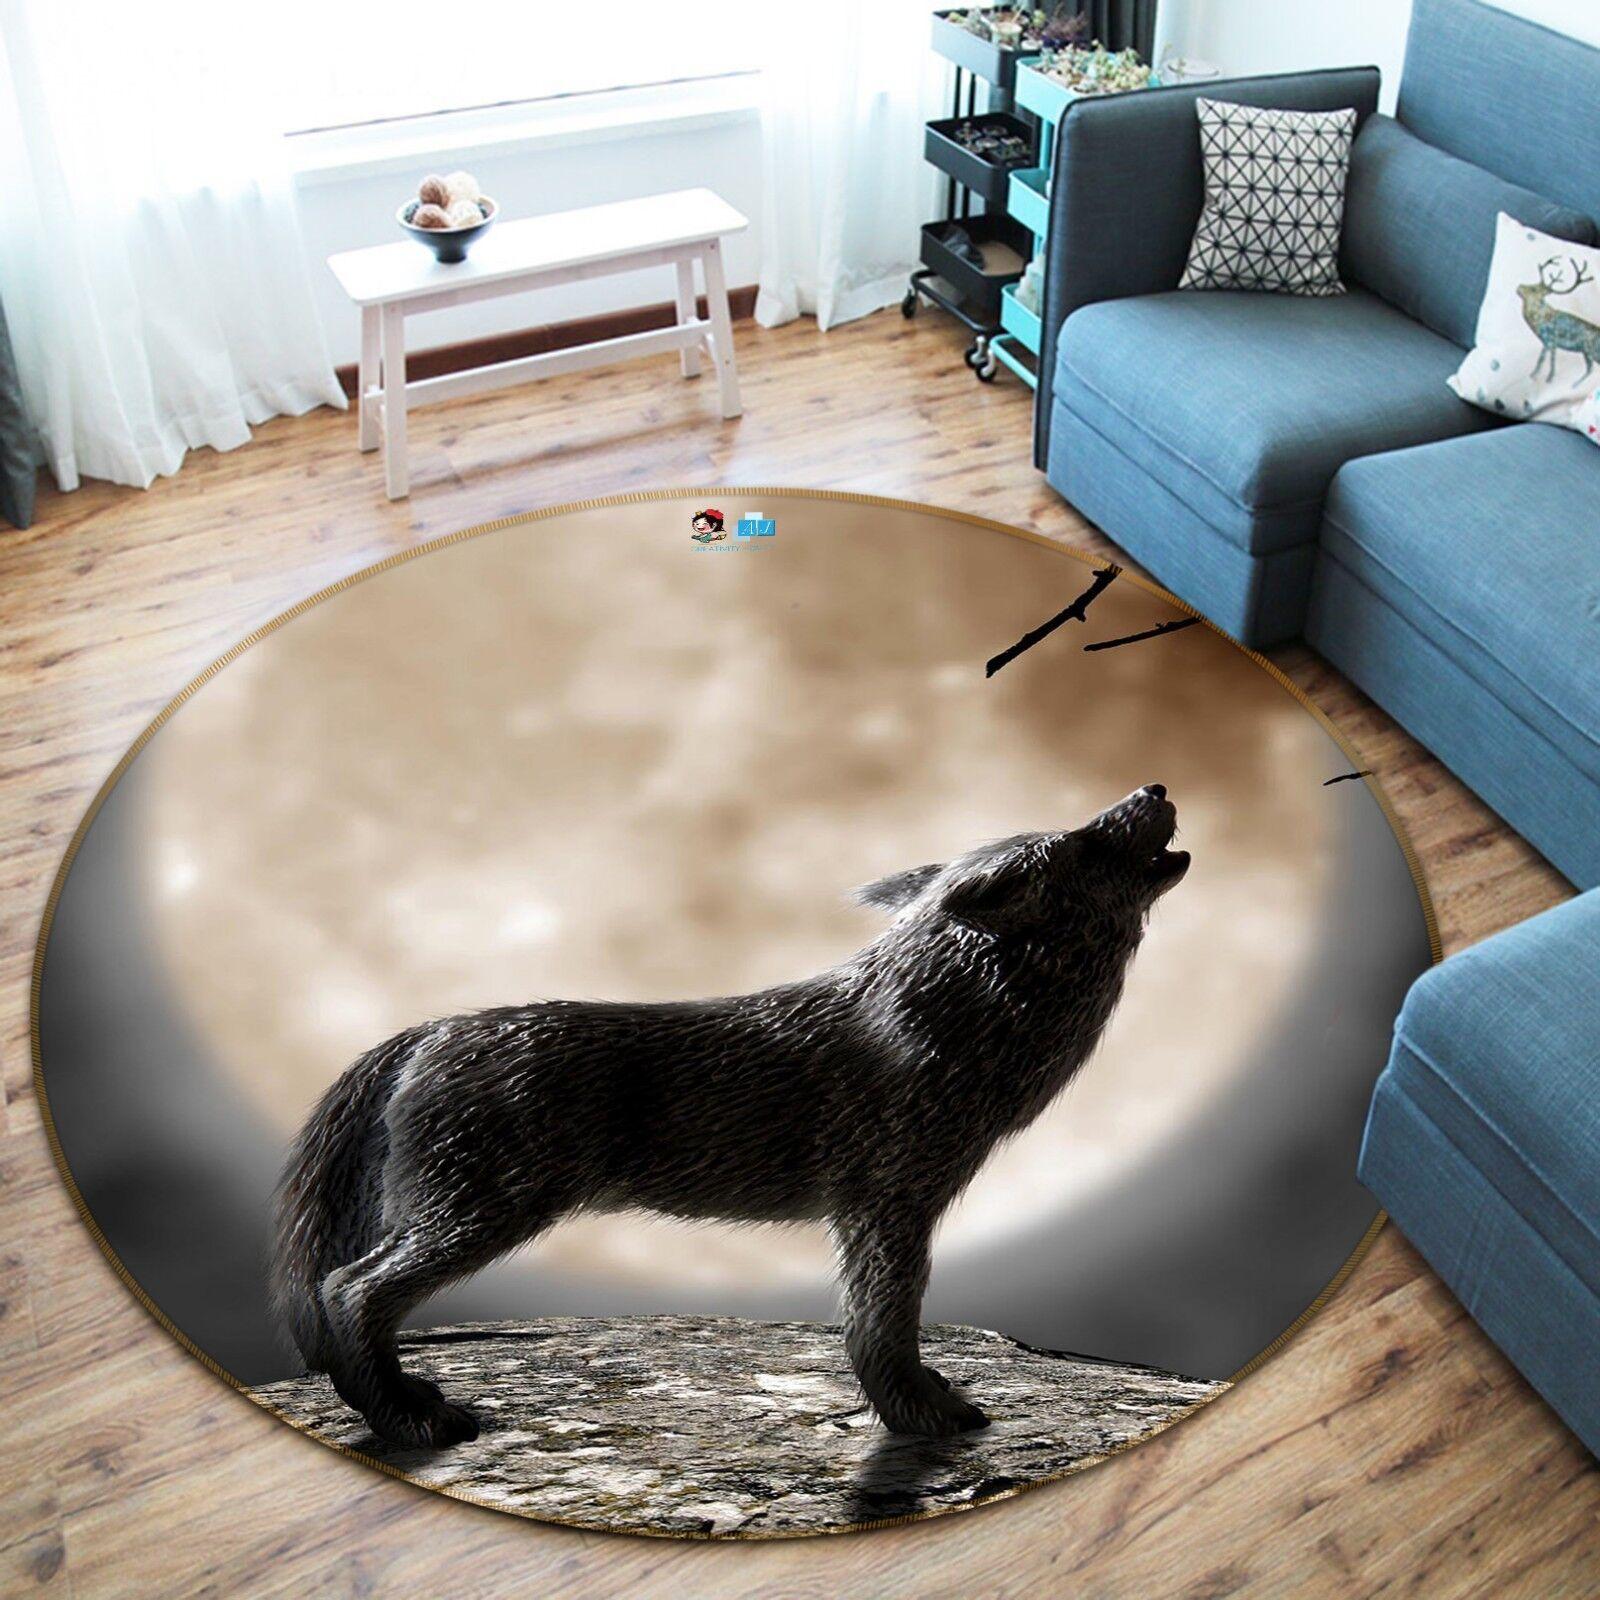 3D Wolf Alfombra colchoneta de la Luna 04 Antideslizante Alfombra de Sala rojoondo elegante Alfombra Reino Unido Carly